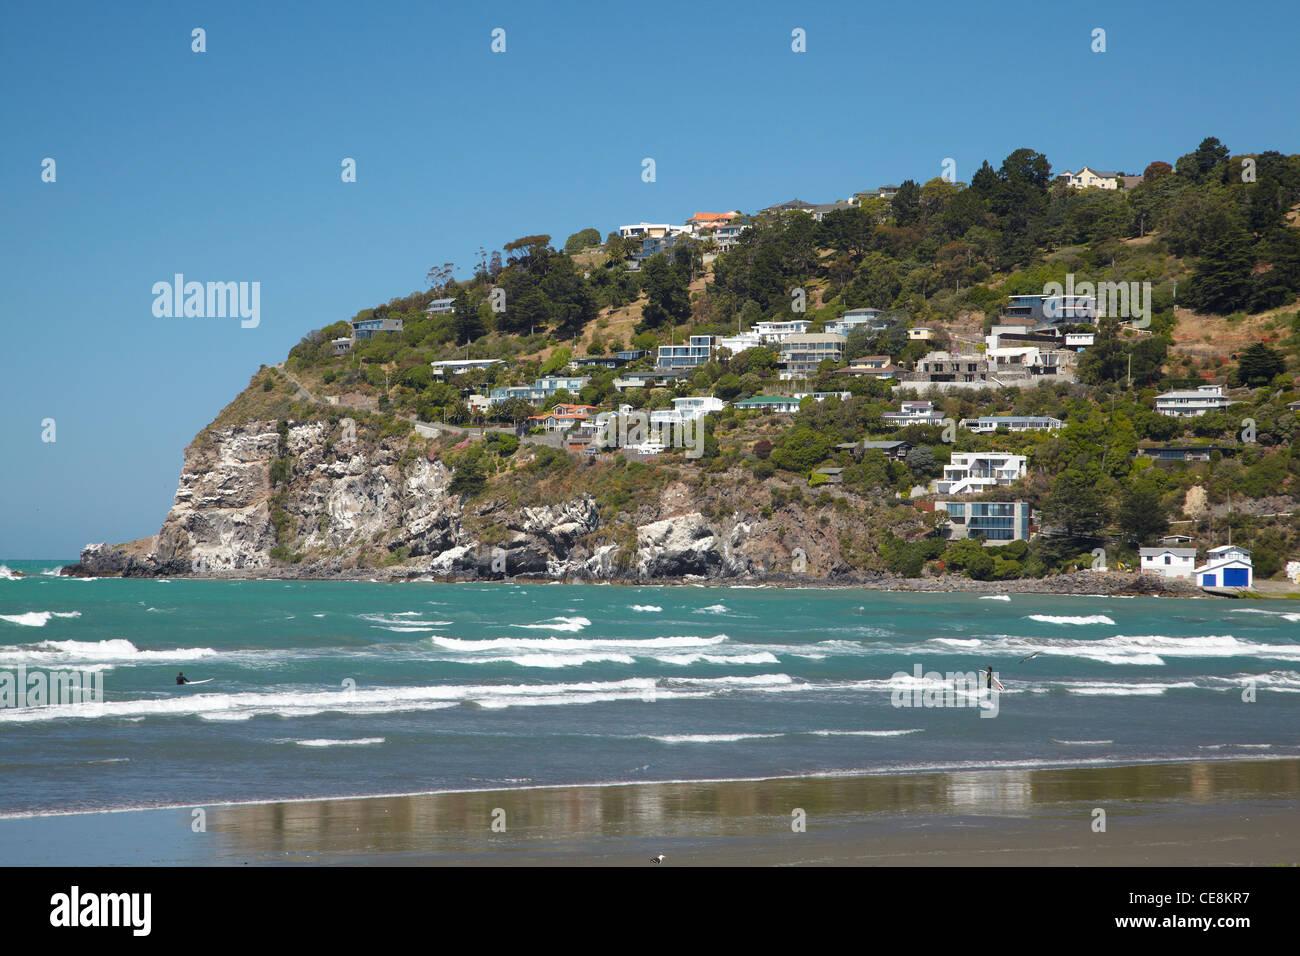 Christchurch New Zealand News: Sumner Beach, Christchurch, Canterbury, South Island, New